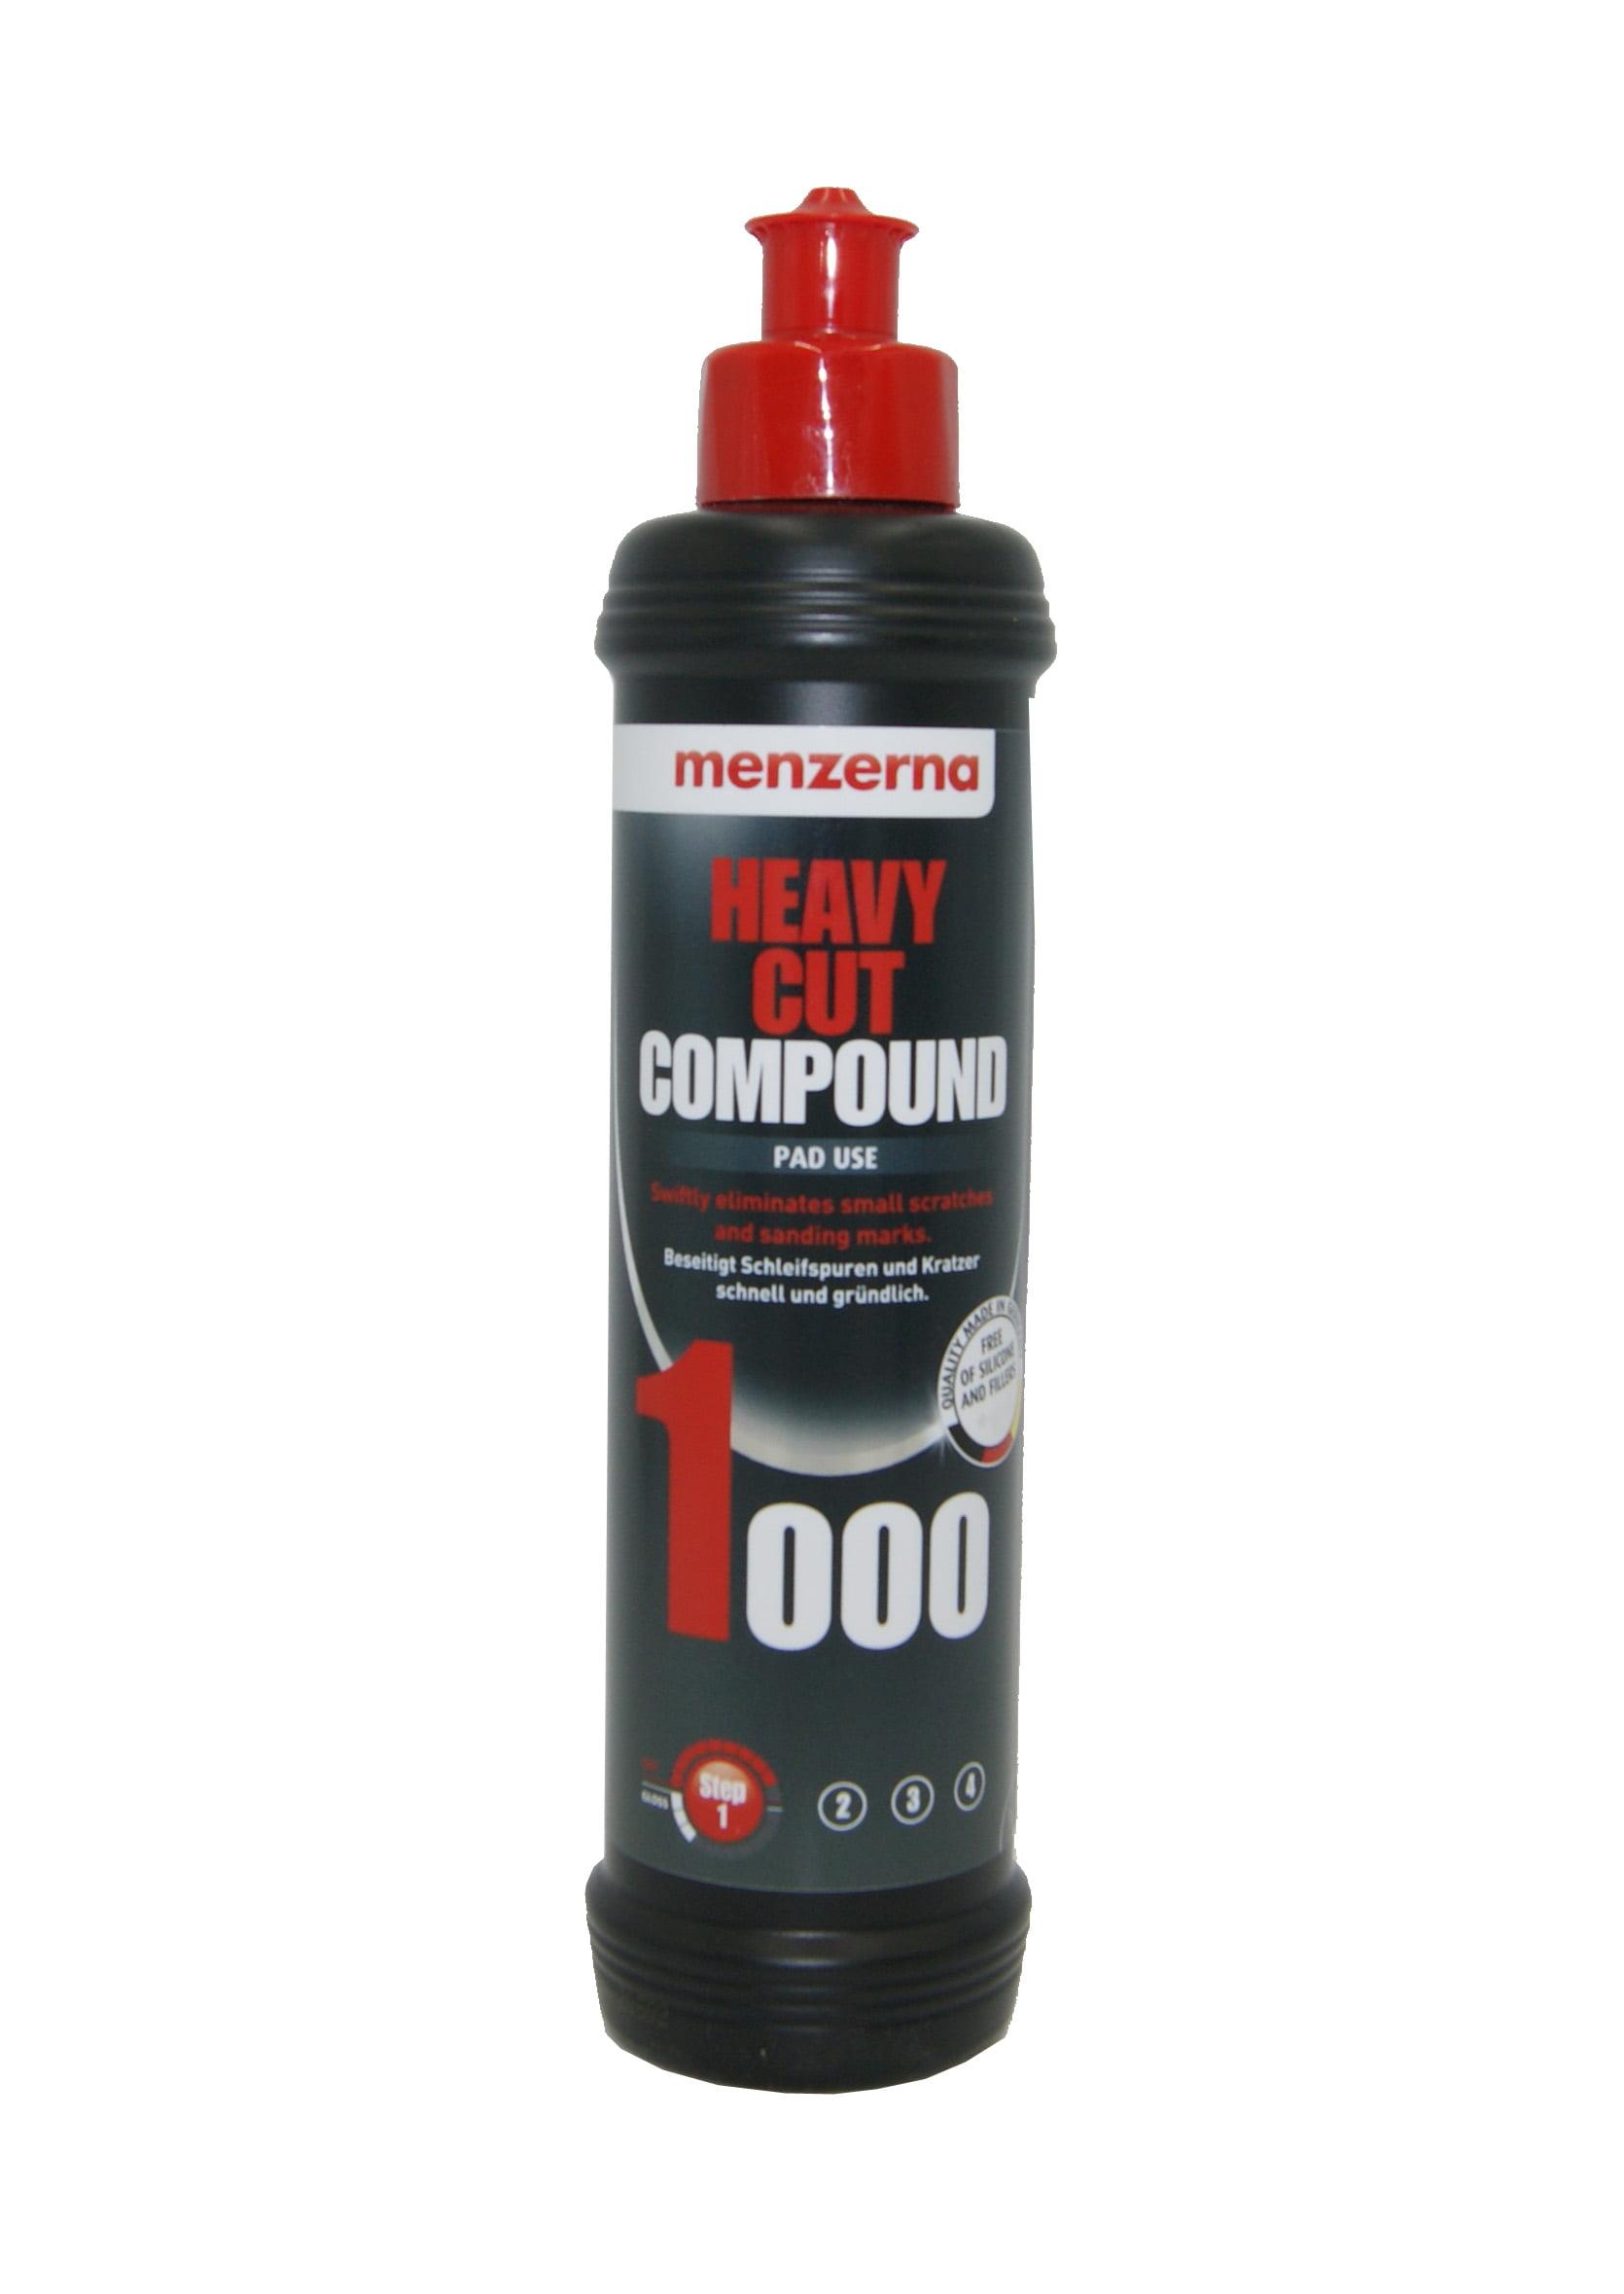 Menzerna 1000 Heavy Cut Compound 250ml Mocno Ścierna Pasta Polerska